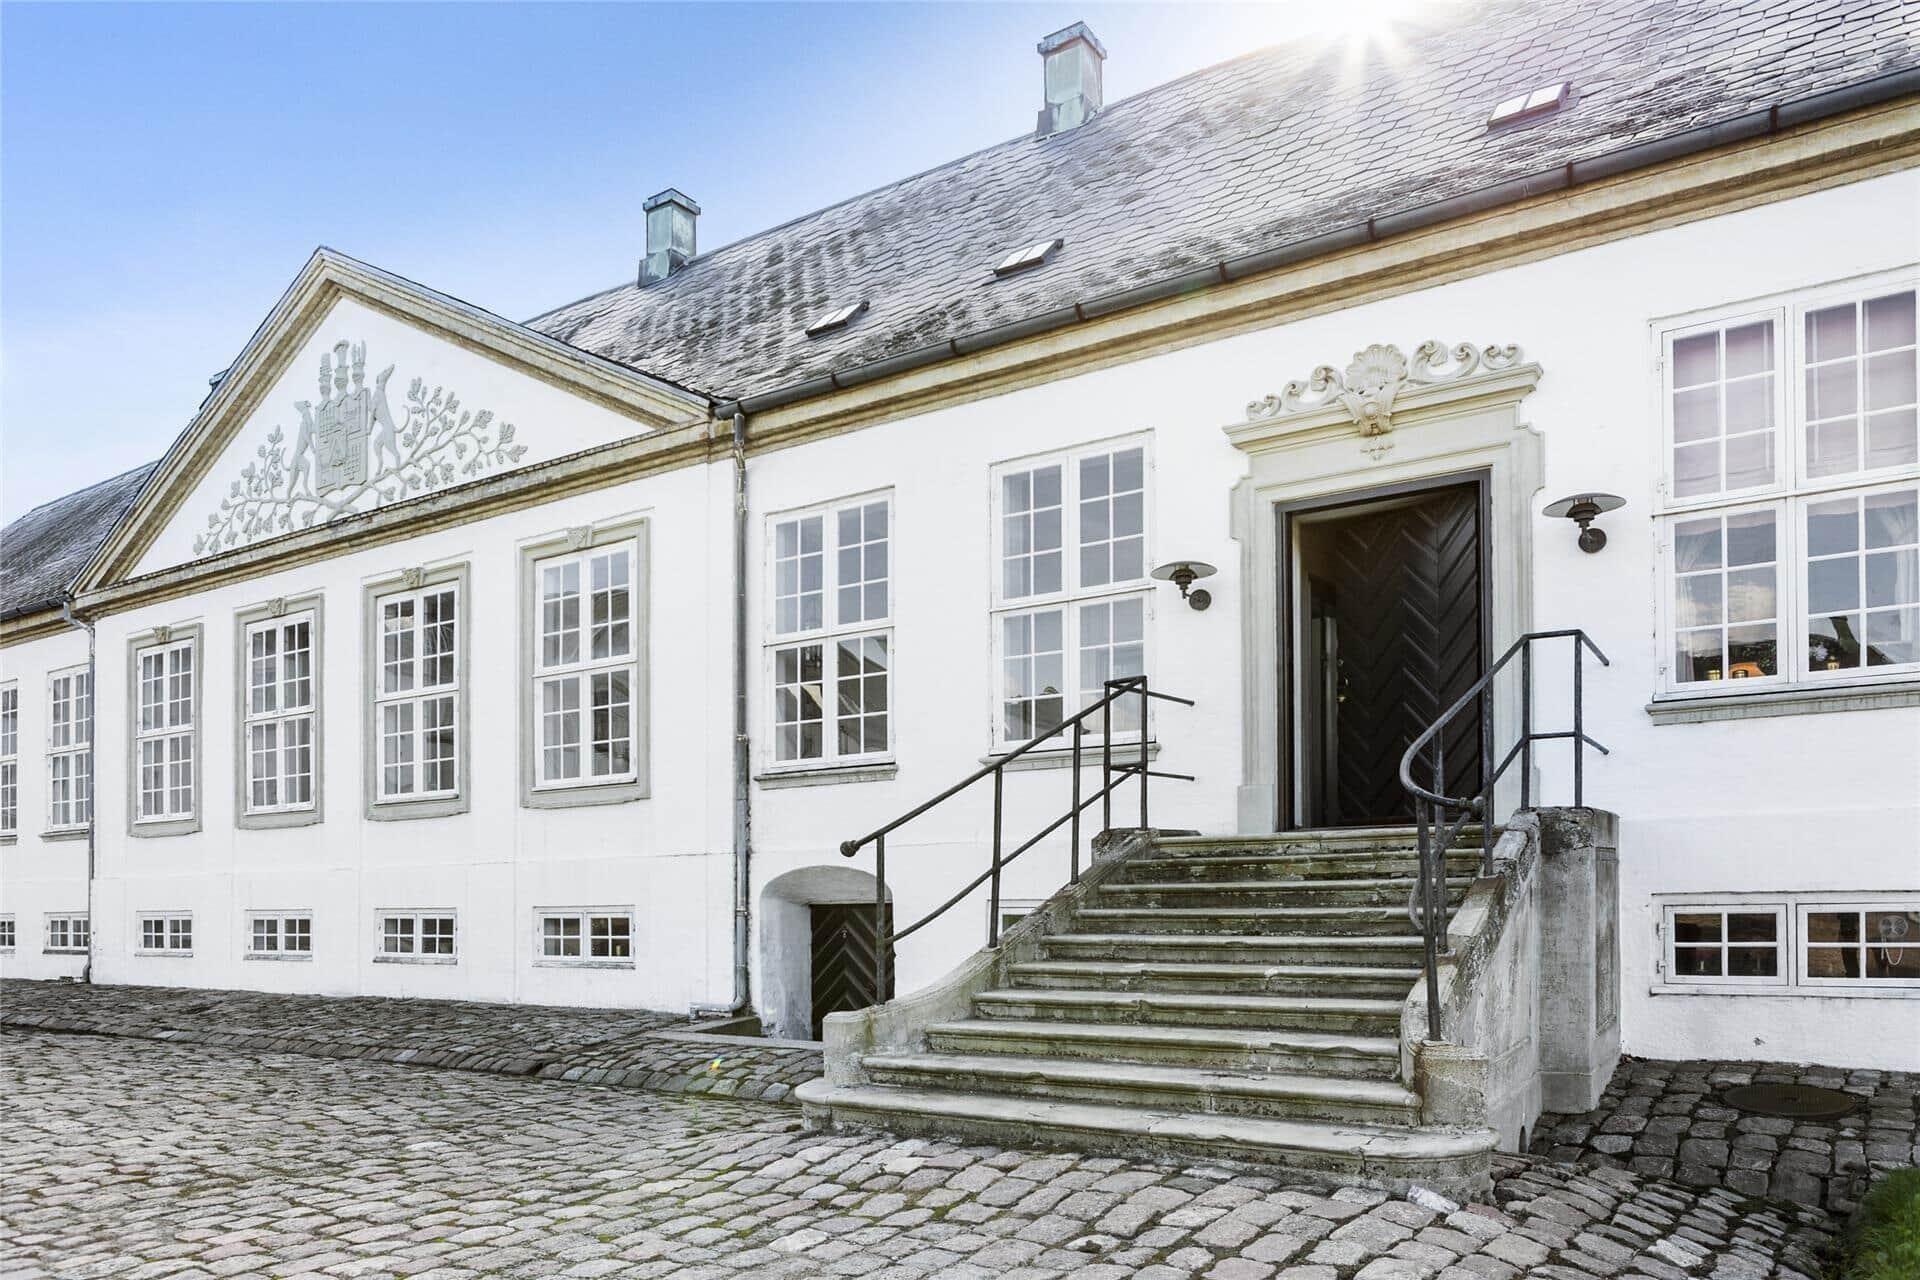 Billede 0-3 Sommerhus S90016, Lerchenborg 3, DK - 4400 Kalundborg